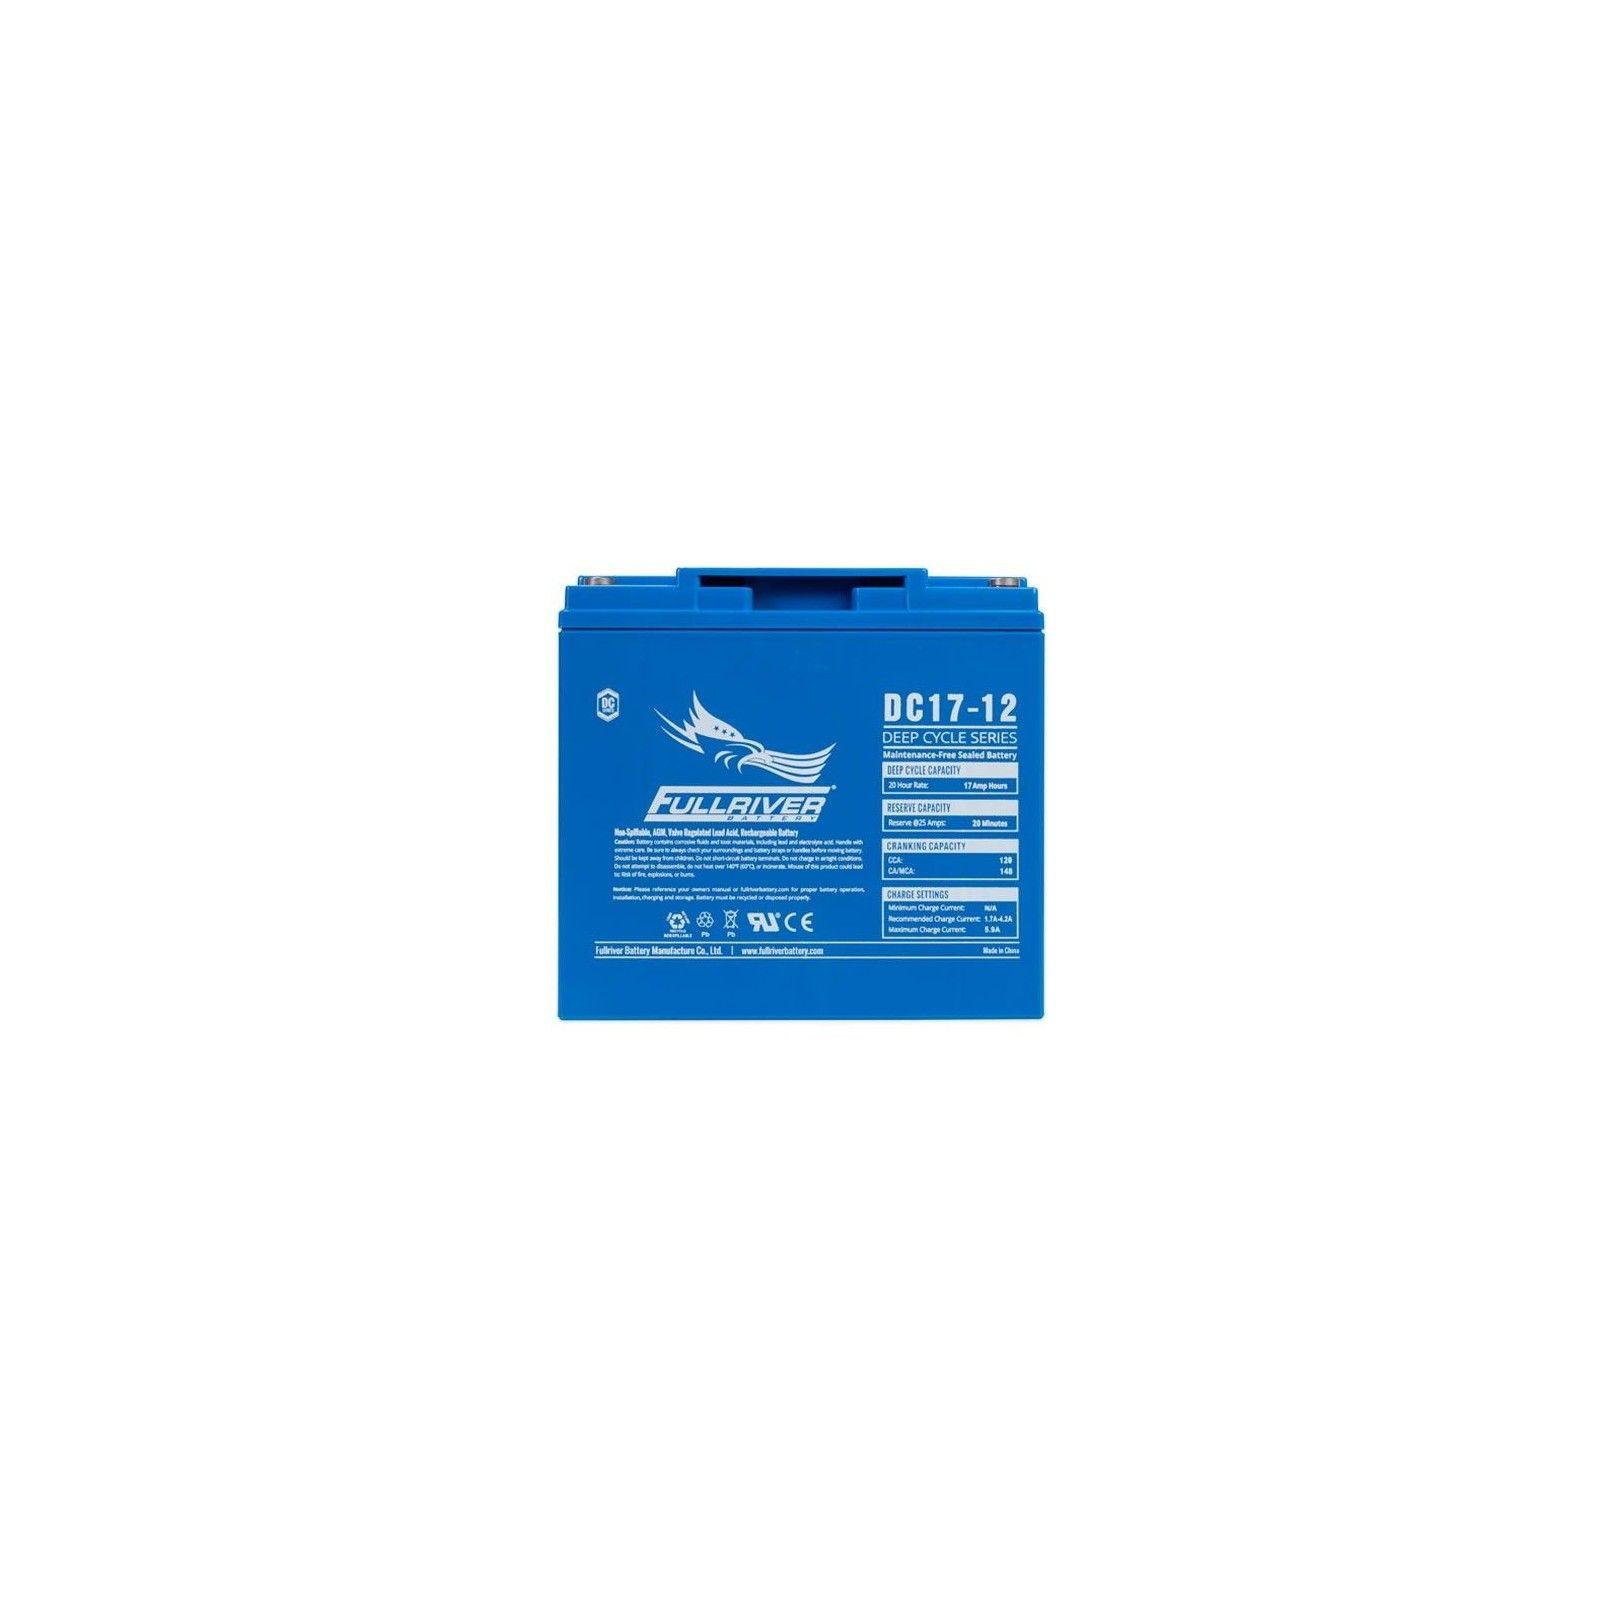 Battery Fullriver DC17-12 17Ah 120A 12V Dc FULLRIVER - 1